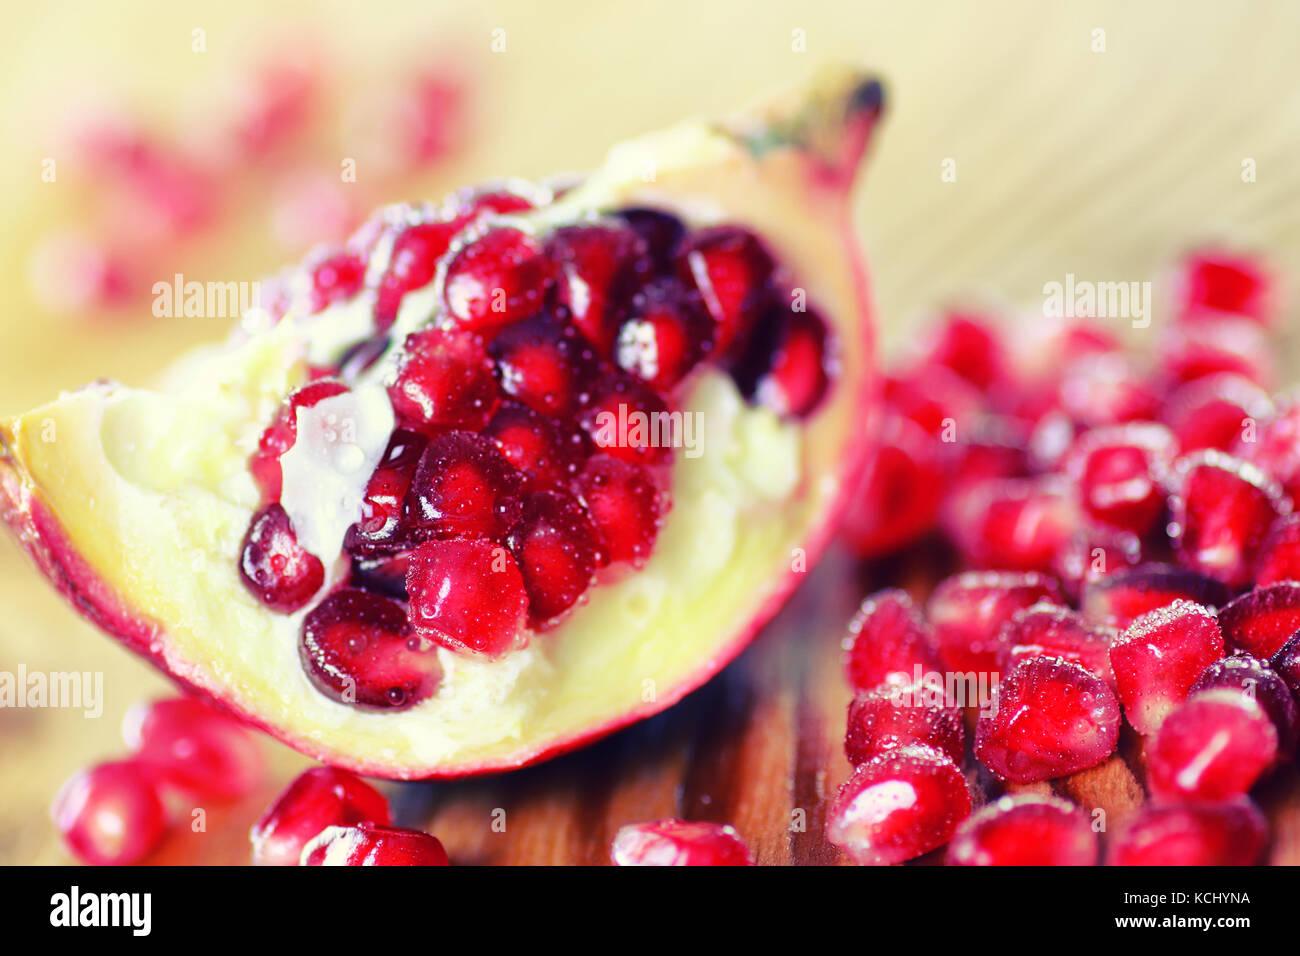 fruit fresh red pomegranate - Stock Image